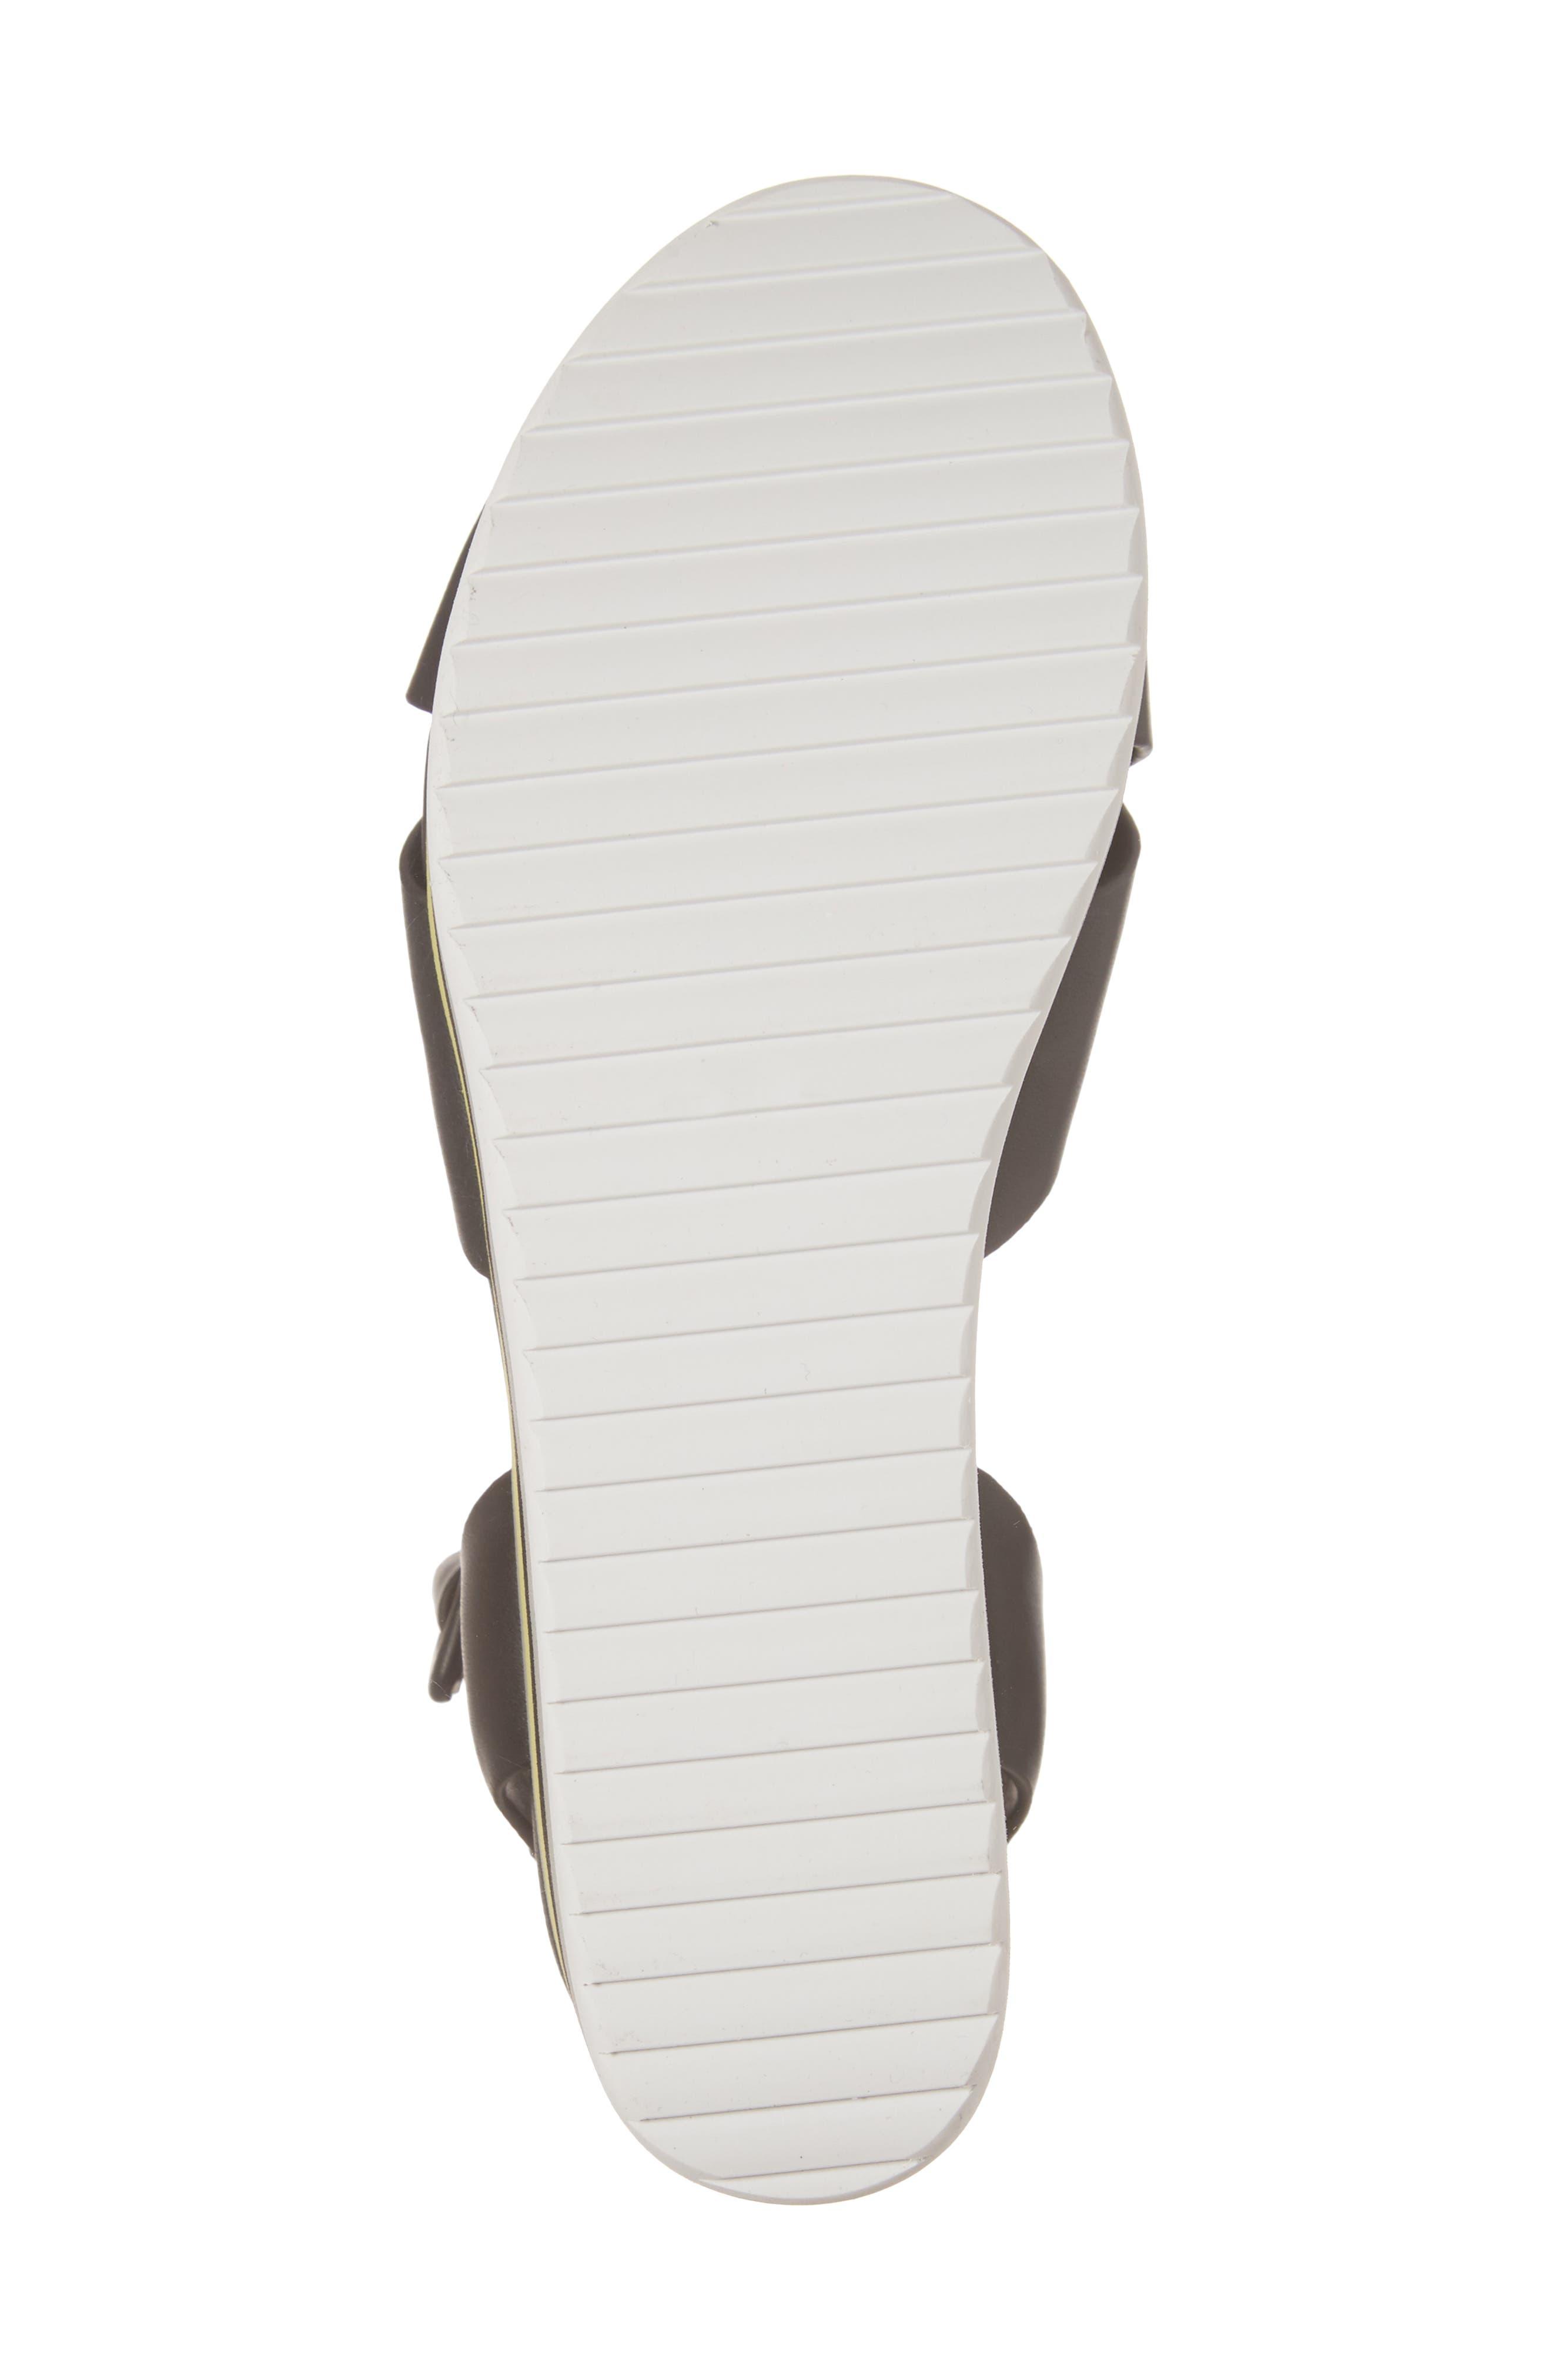 Macer Cuffed Platform Sandal,                             Alternate thumbnail 6, color,                             015